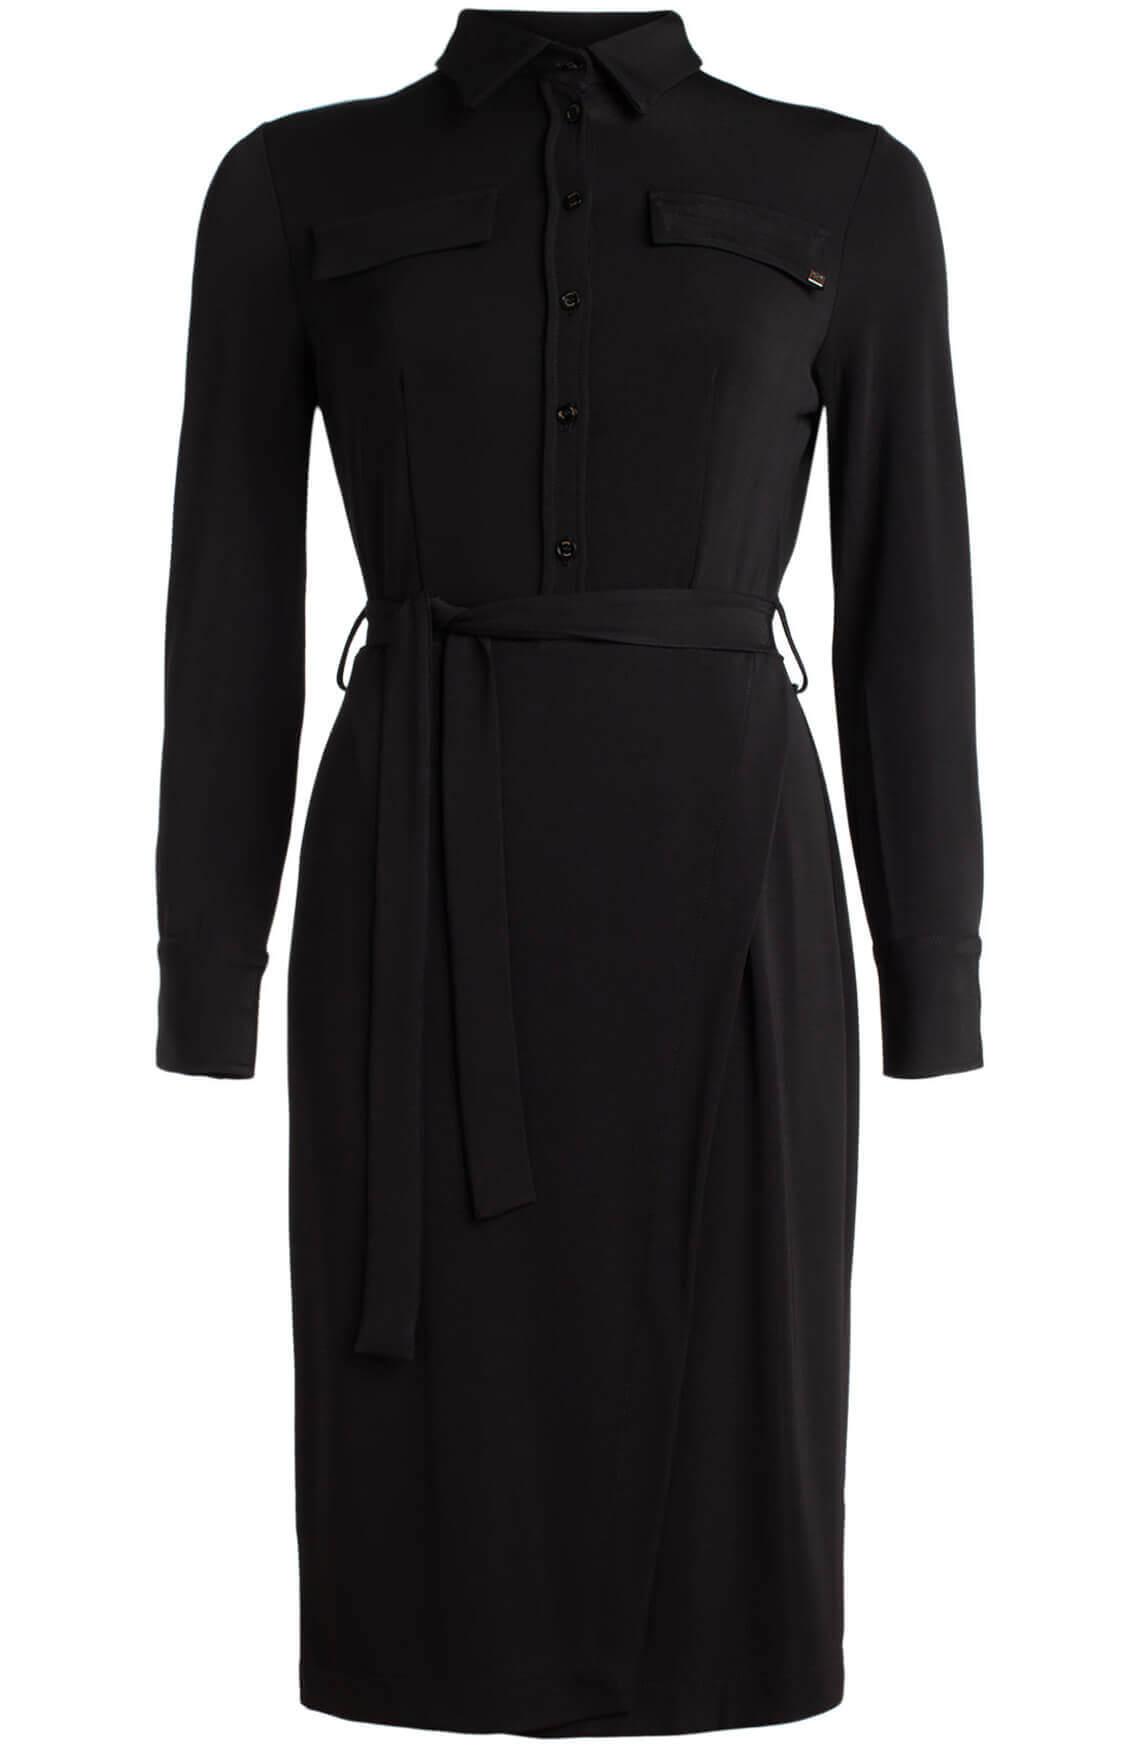 Kocca Dames Madras glanzende jurk met ceintuur zwart